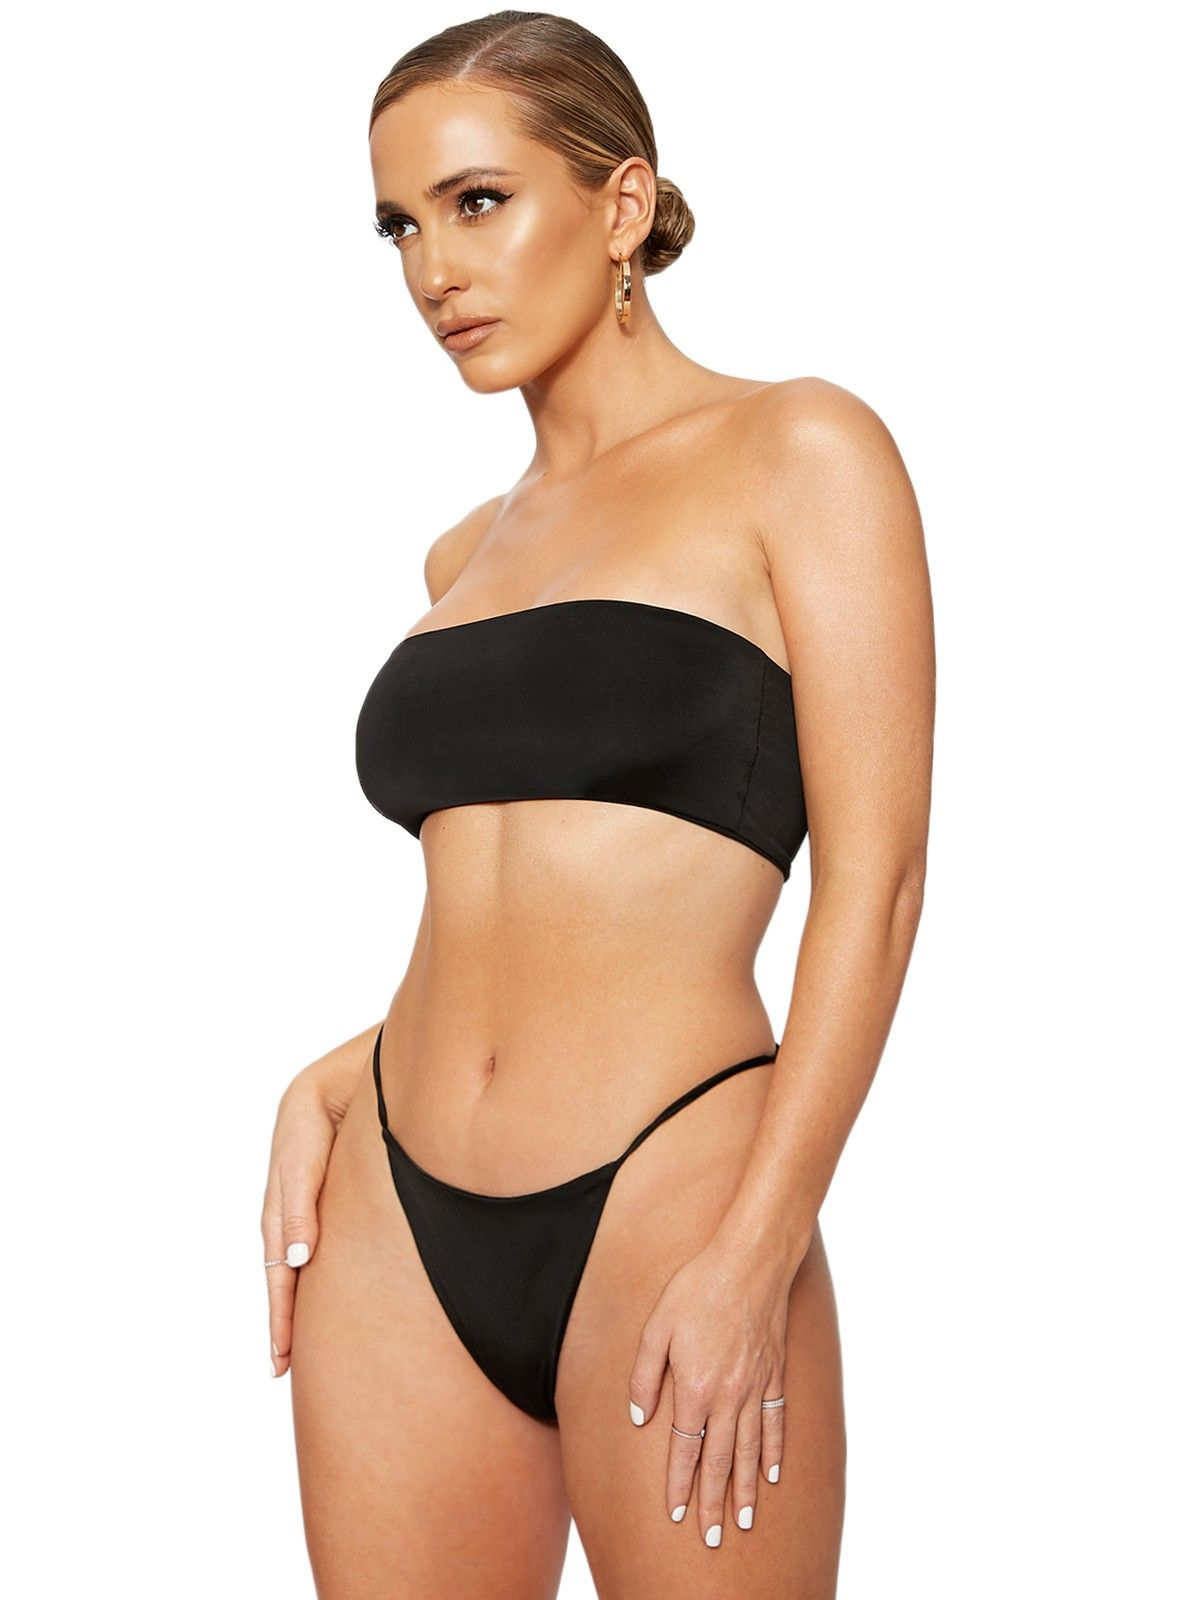 d838b29635 Bad Beach Bandeau Bikini - New Arrivals Bandeau Bikini